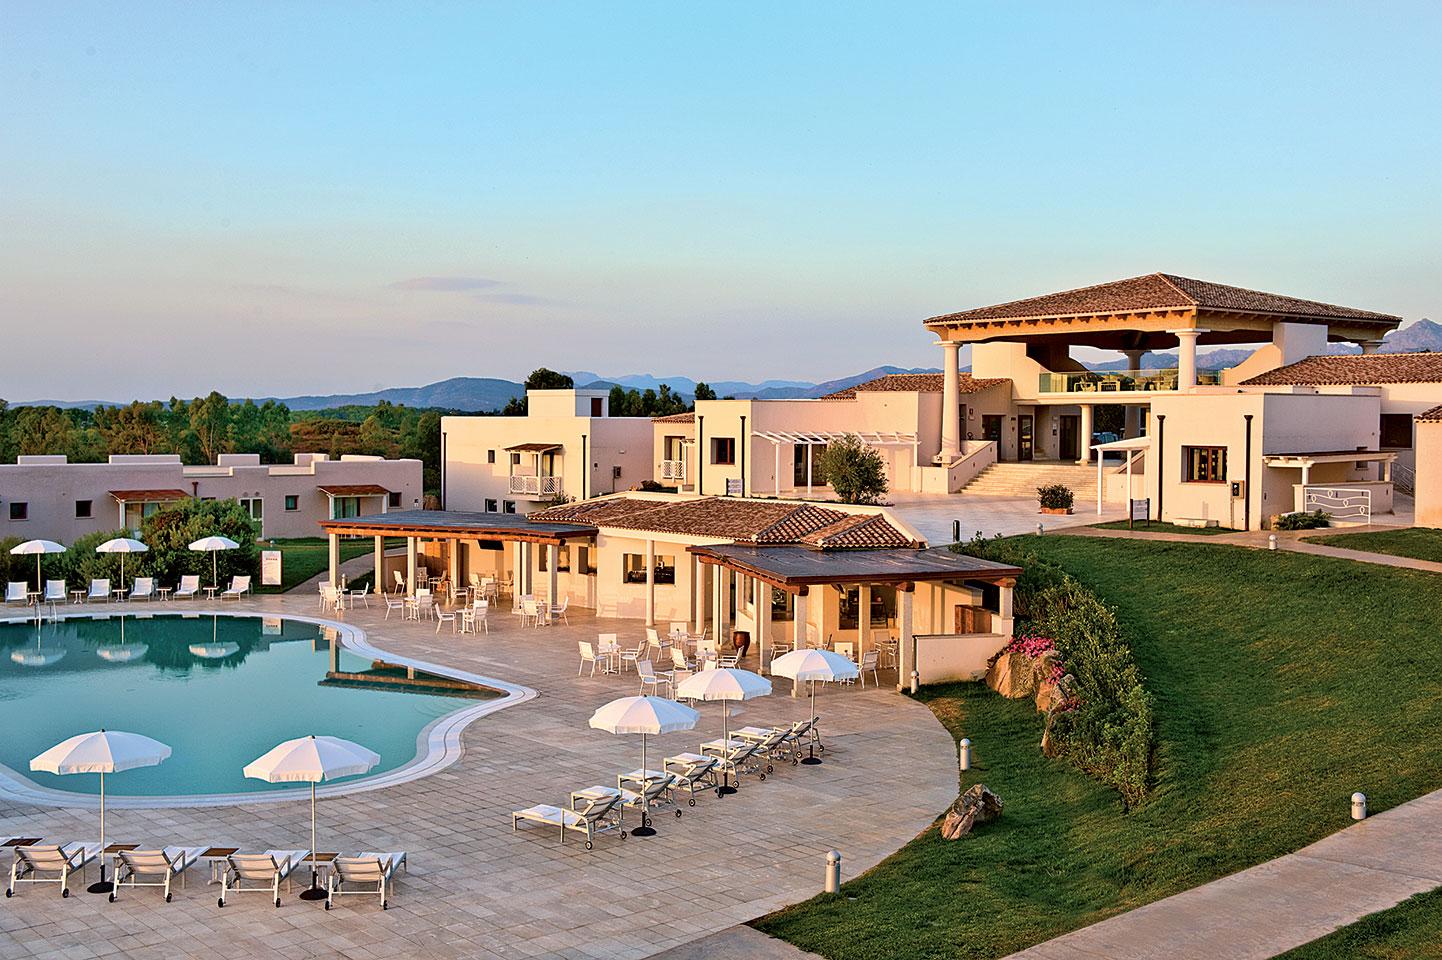 Residence grande baia san teodoro sardinia italy for Residence in sardegna